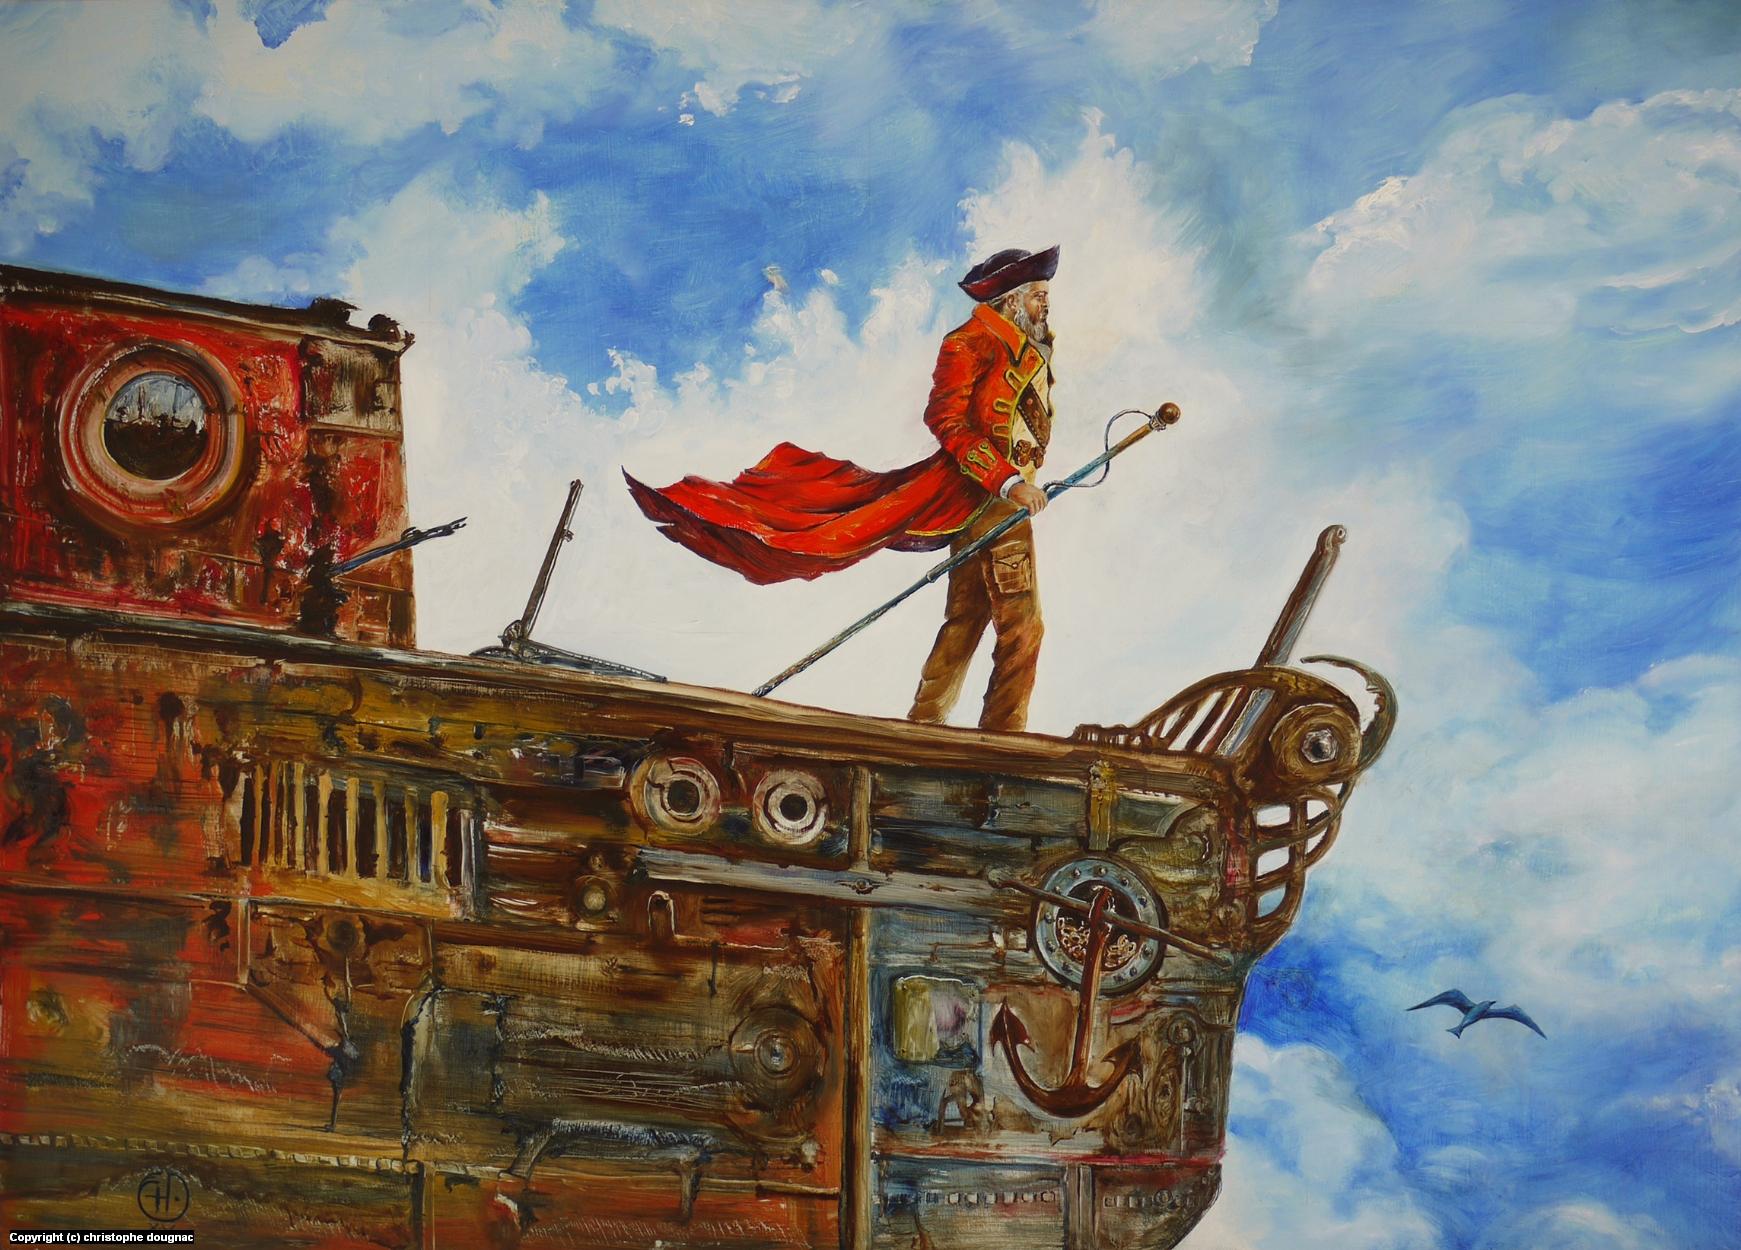 Capitaine Artwork by Christophe Dougnac